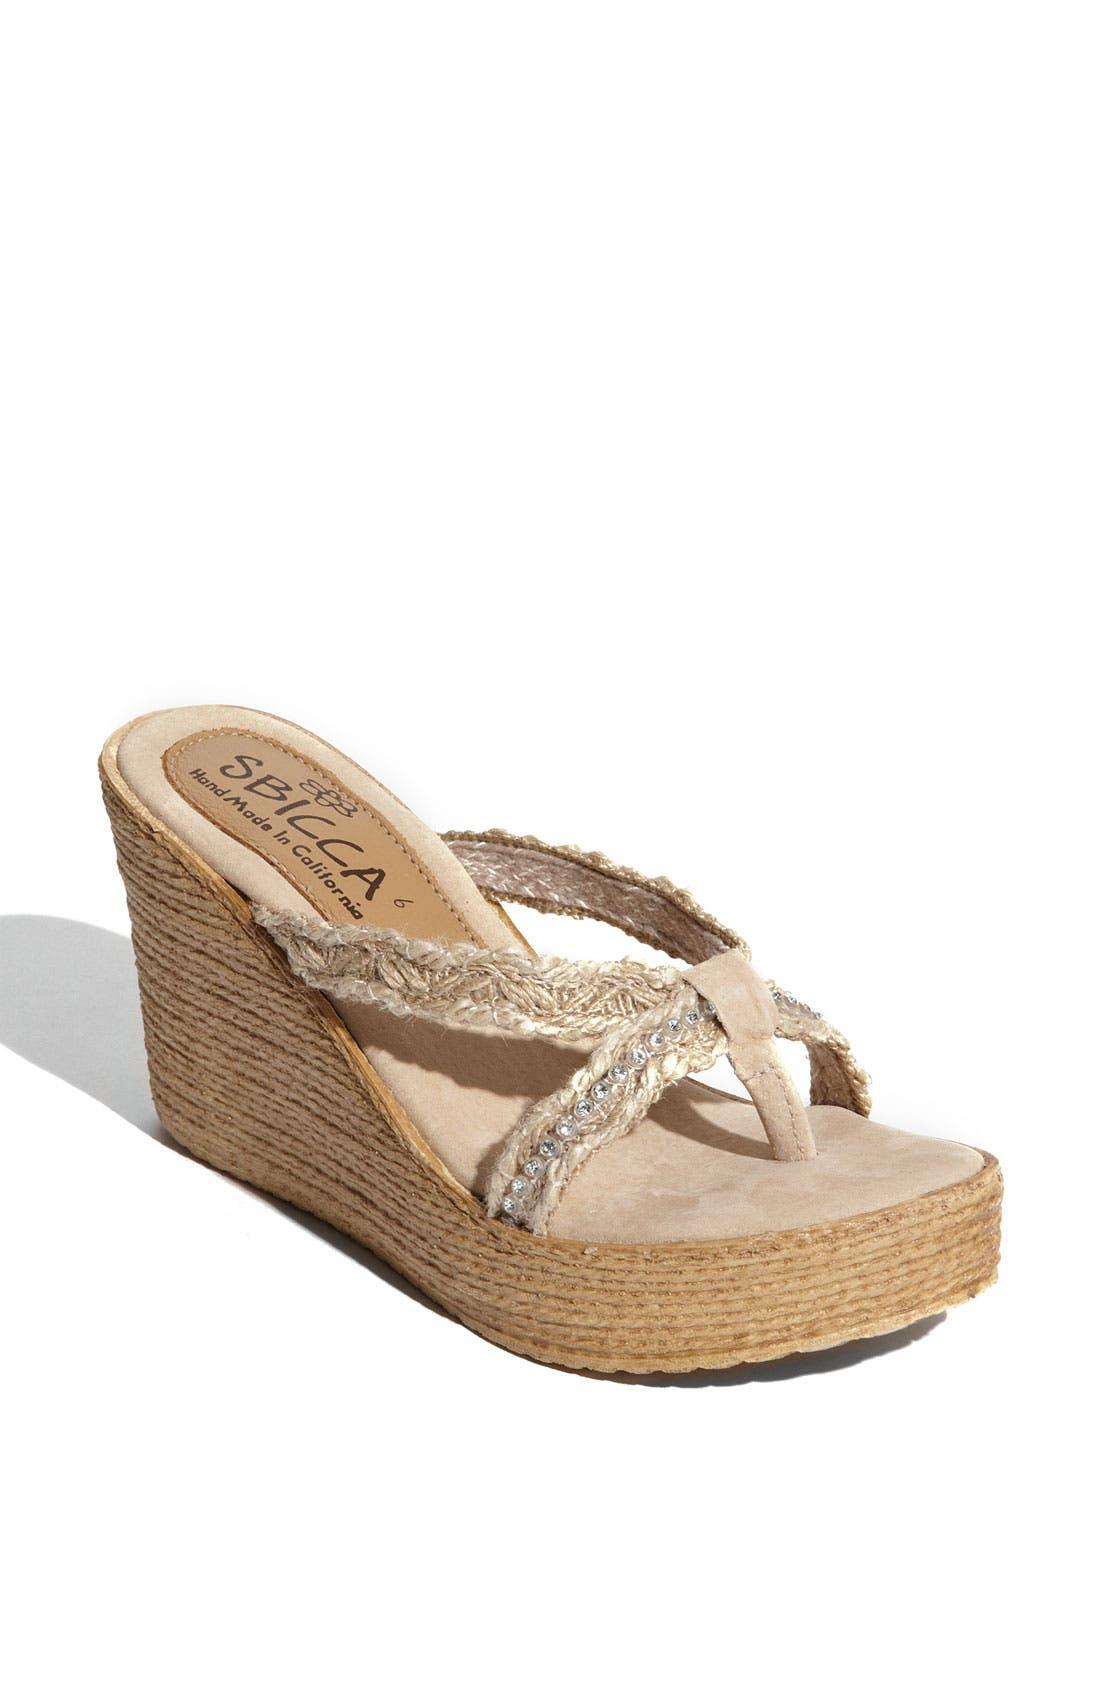 Main Image - Sbicca 'Jewel' Sandal